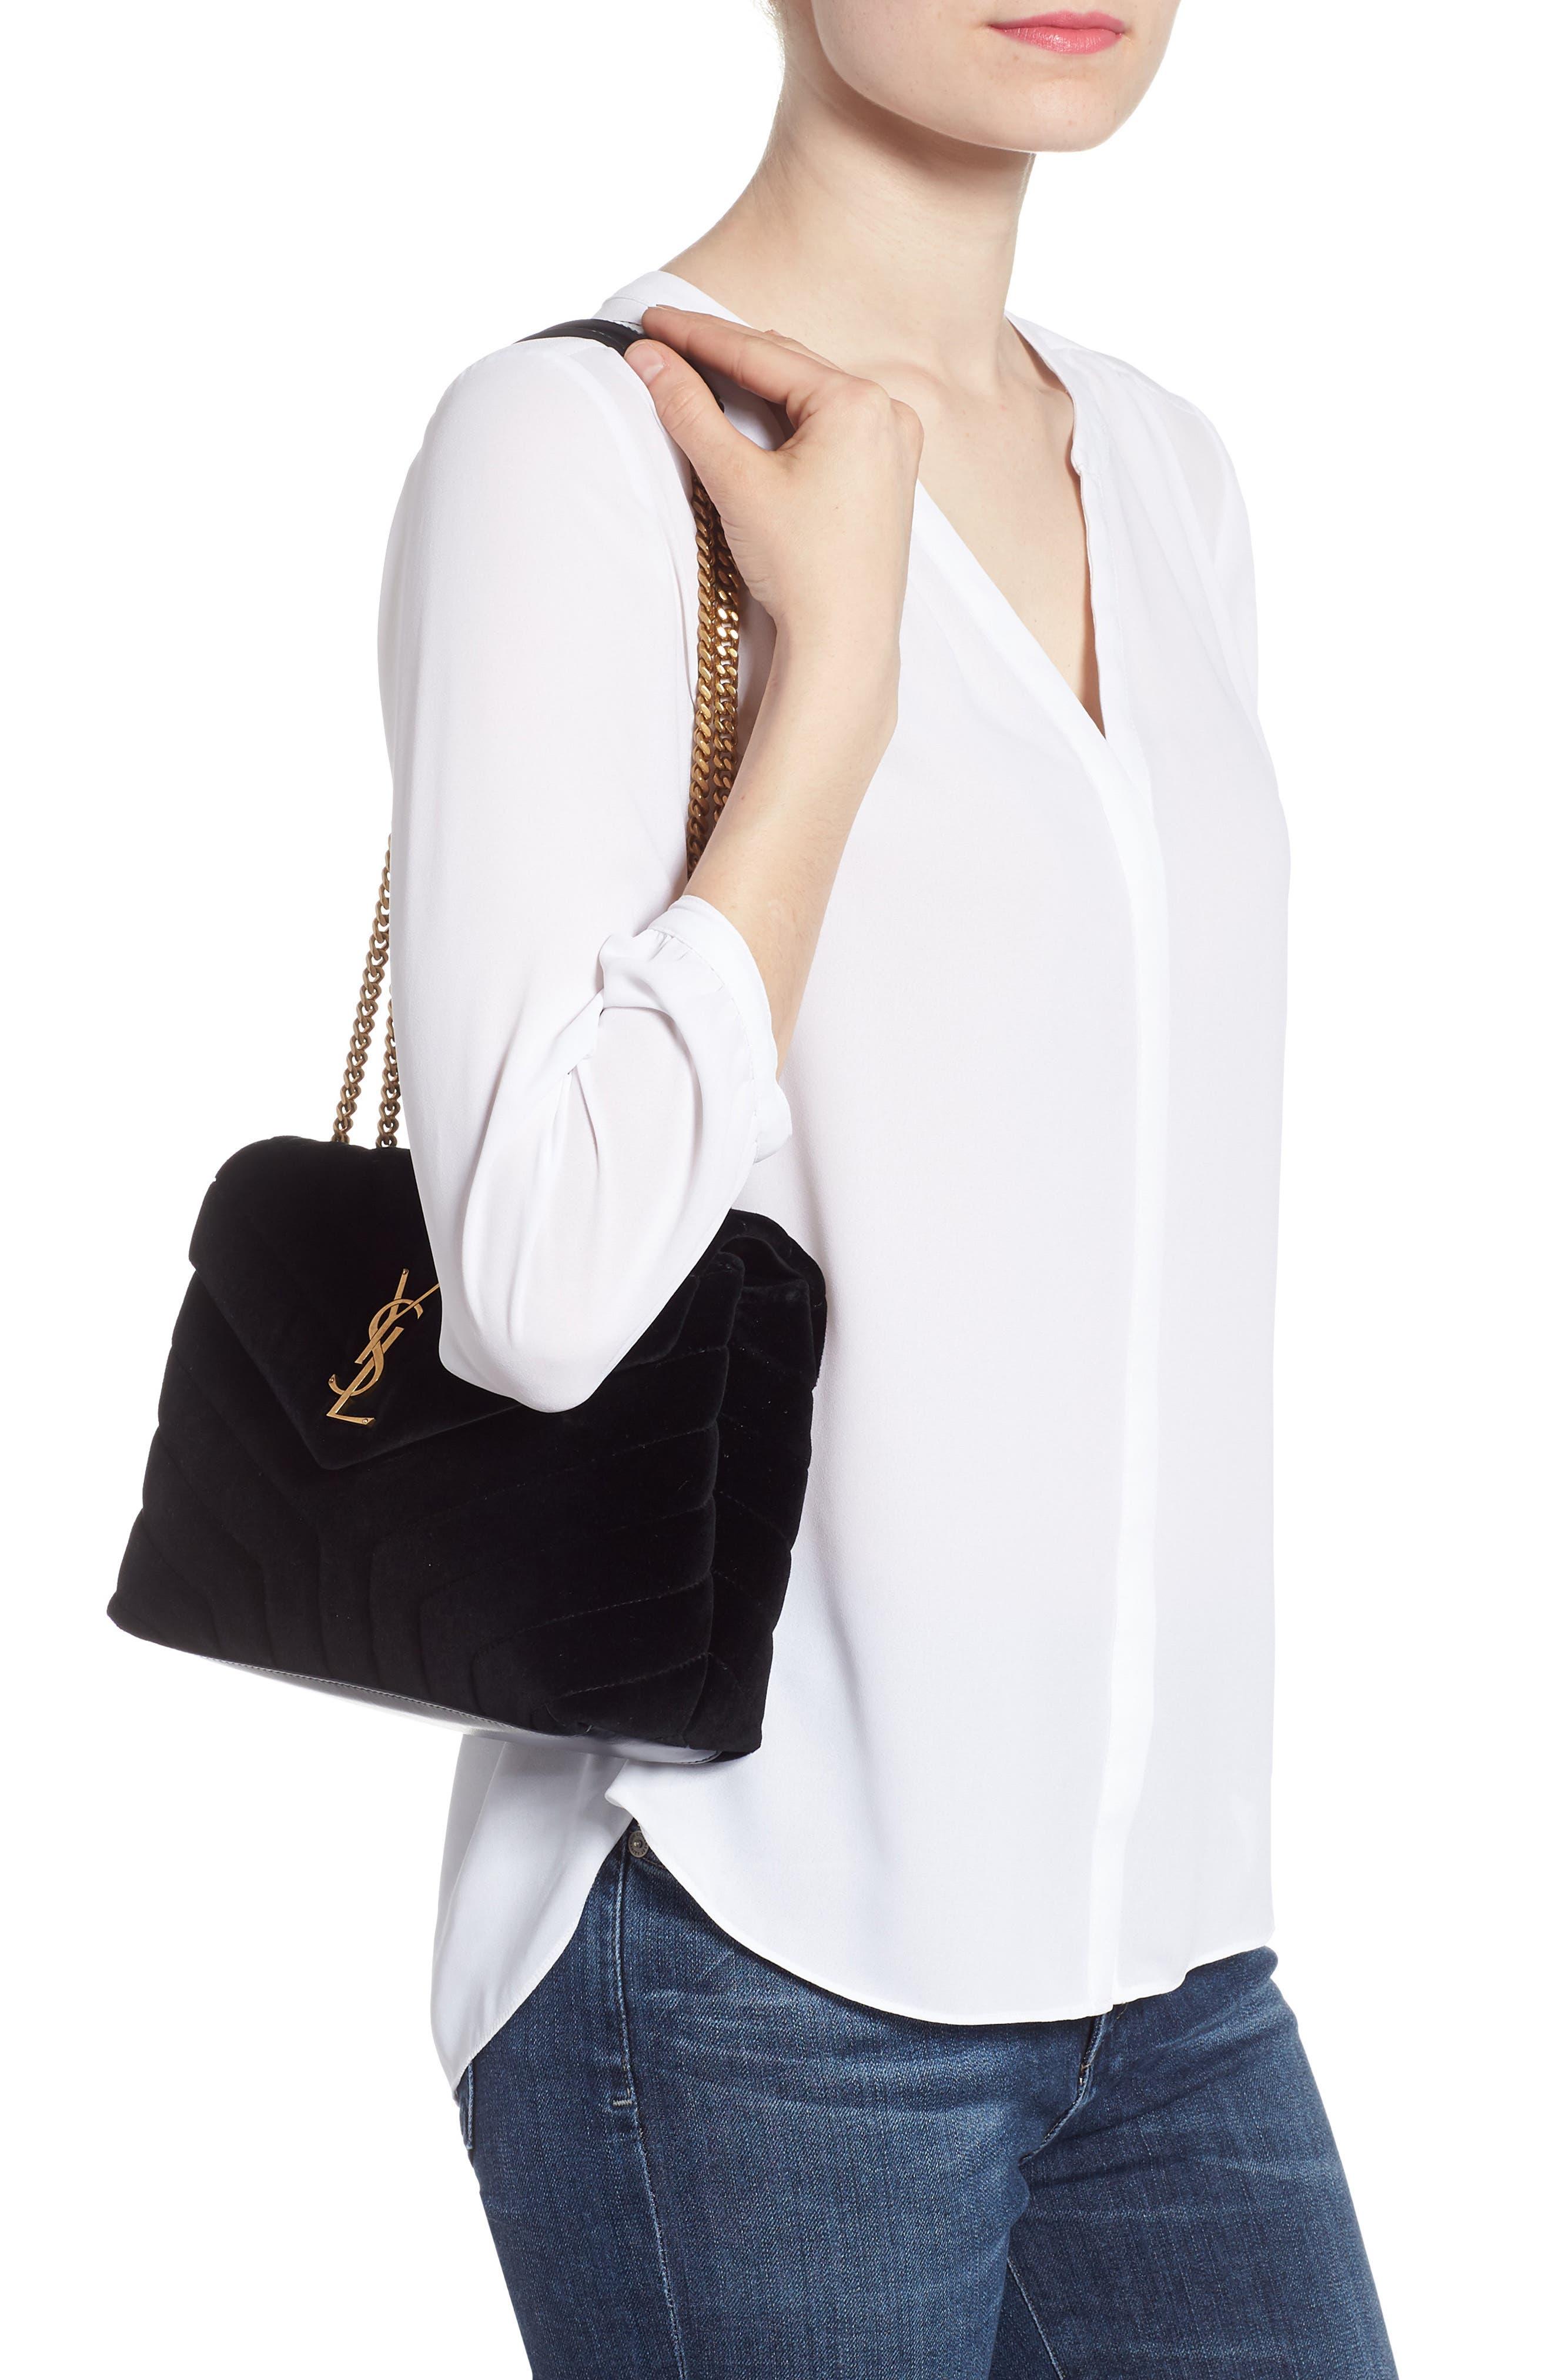 SAINT LAURENT,                             Small Loulou Velvet Shoulder Bag,                             Alternate thumbnail 2, color,                             NERO/ NERO/ NERO